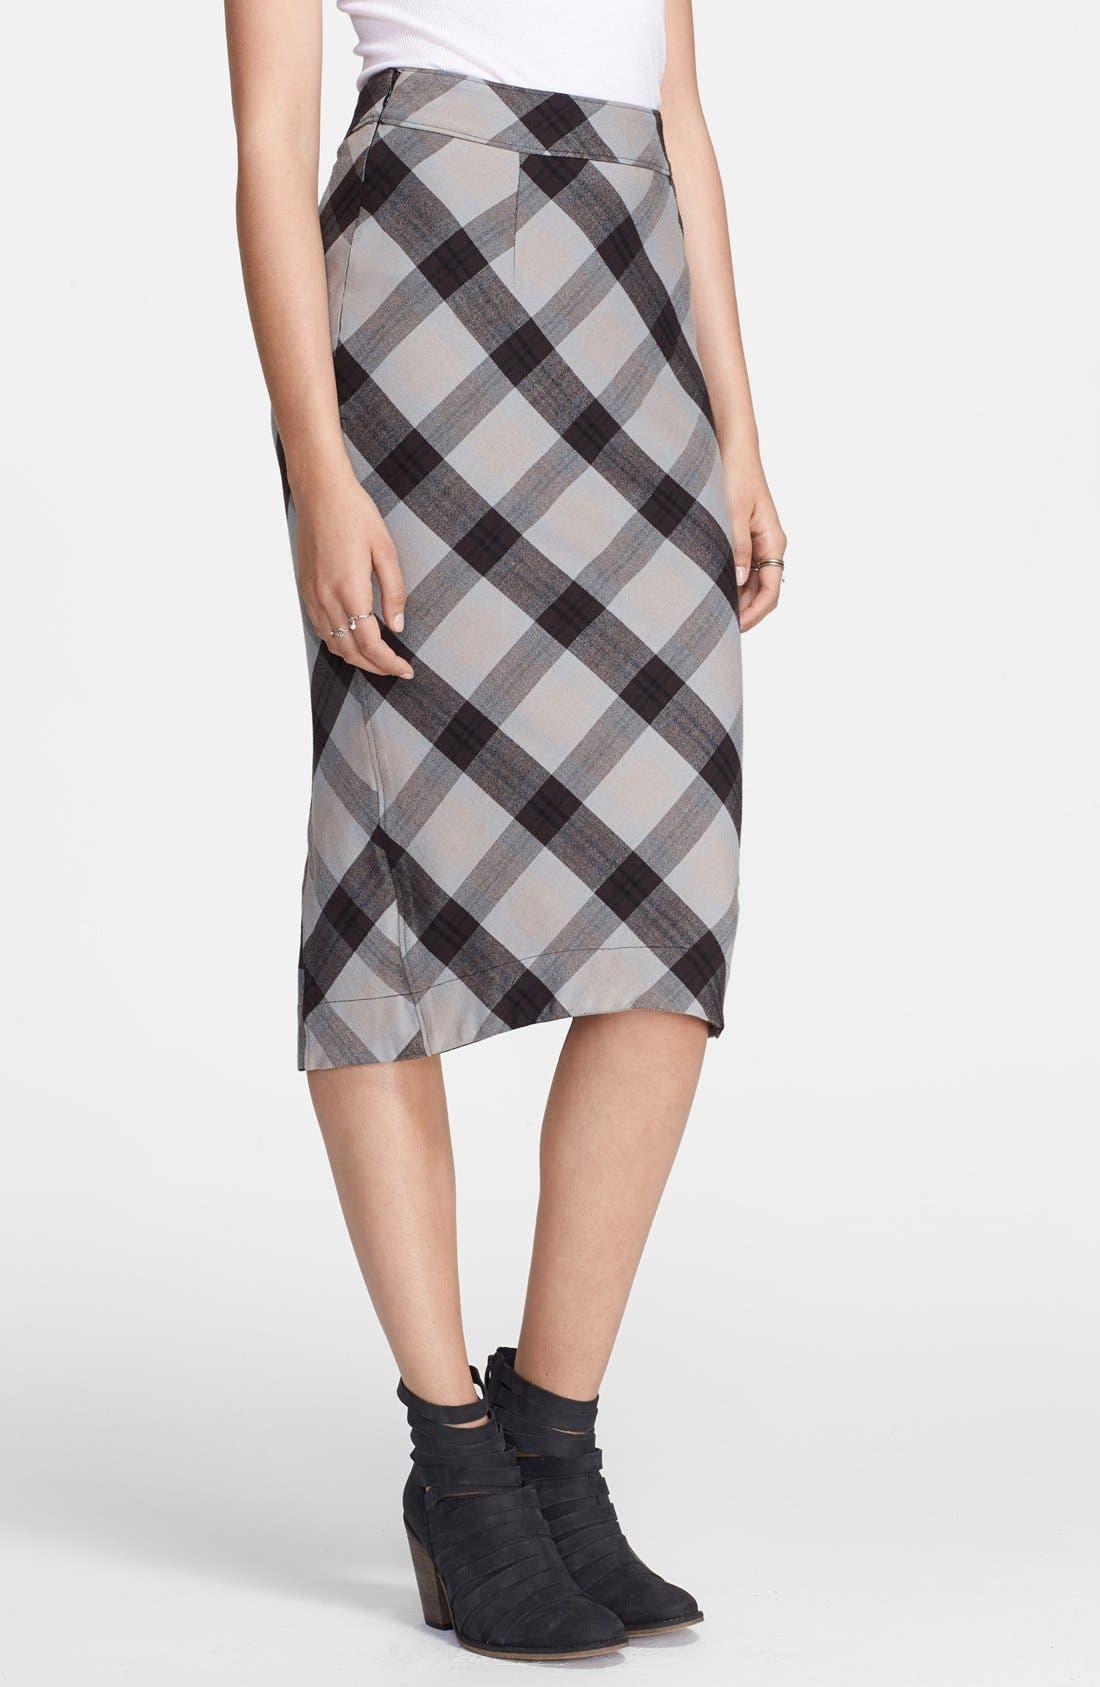 Alternate Image 1 Selected - Free People 'Geometric Precision' Plaid Pencil Skirt